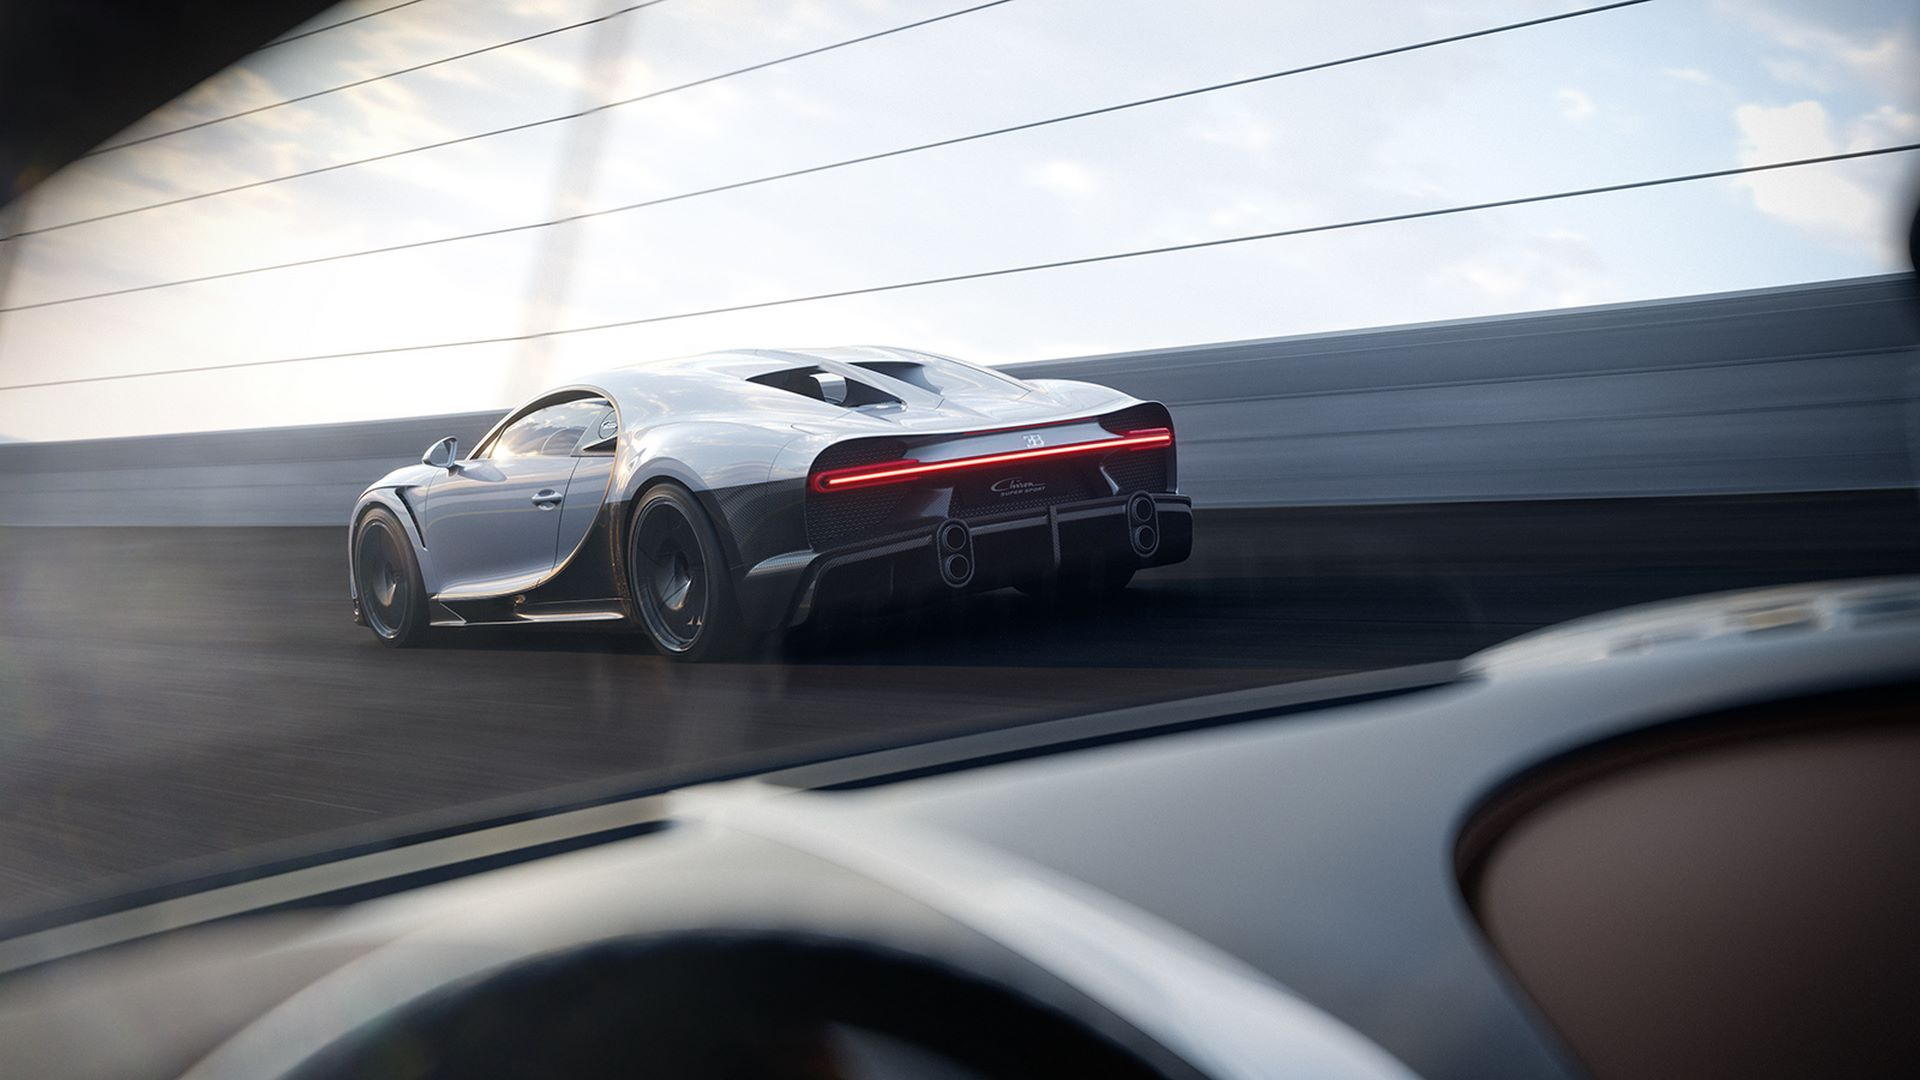 02_07_bugatti_chiron_super_sport_high_speed_rear